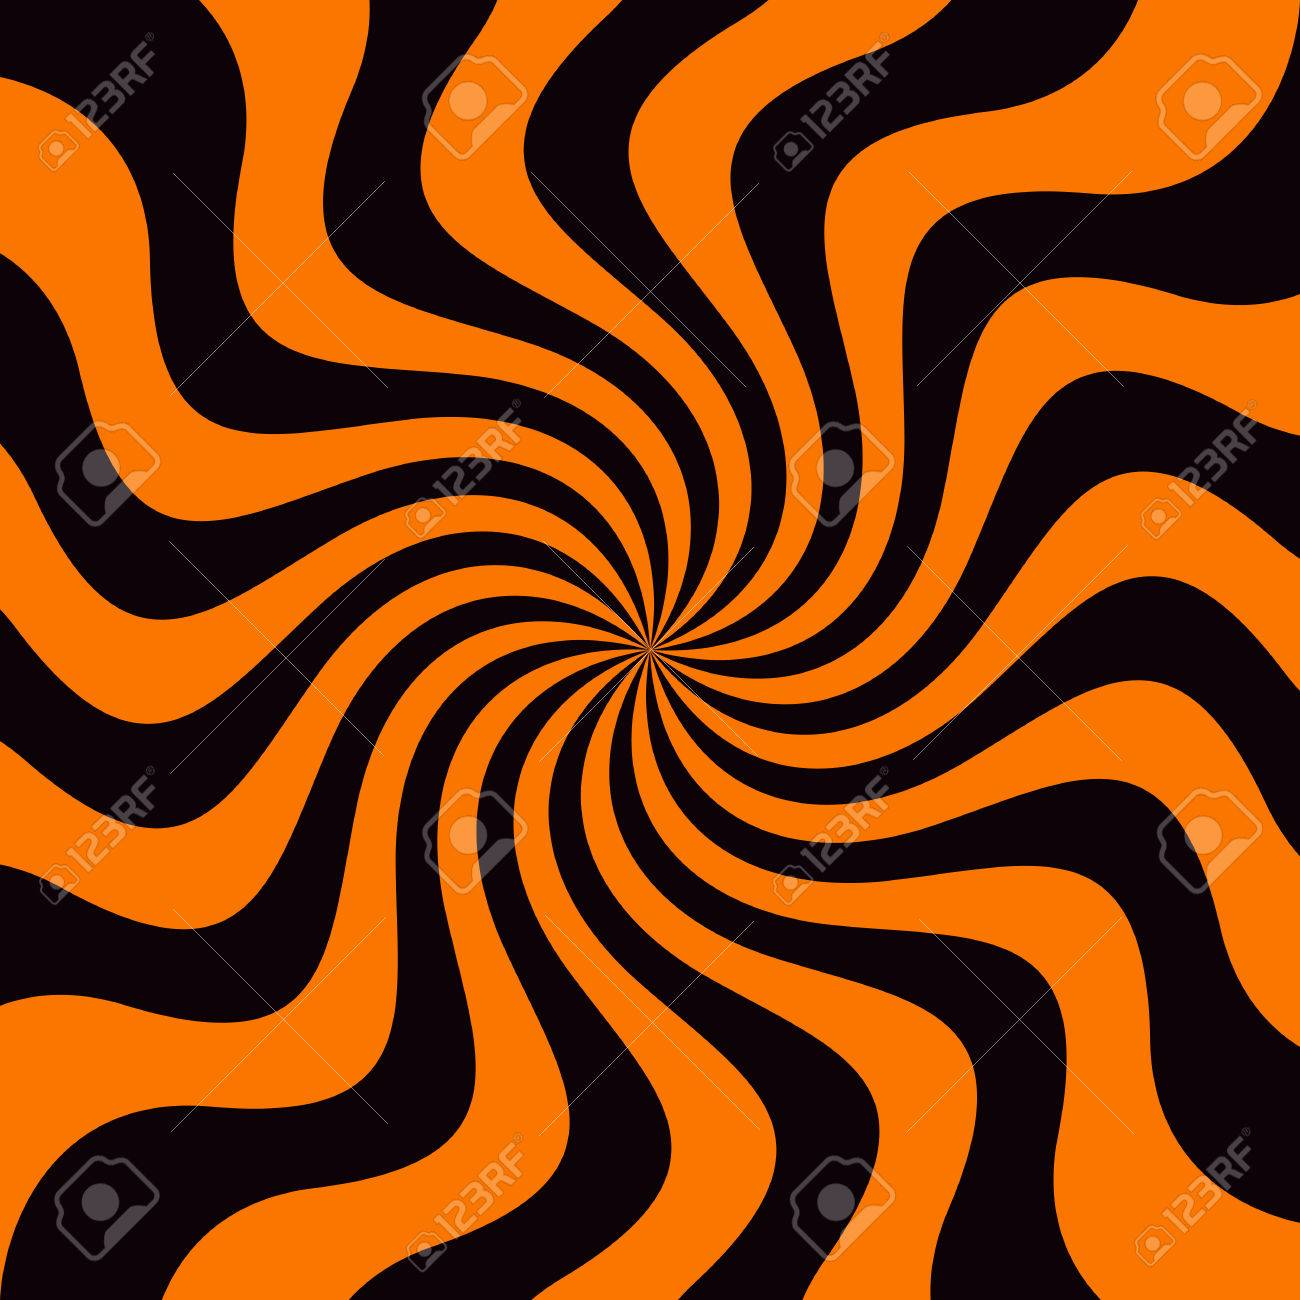 Grunge Sunbeam Background In Halloween Traditional Colors Orange 1300x1300